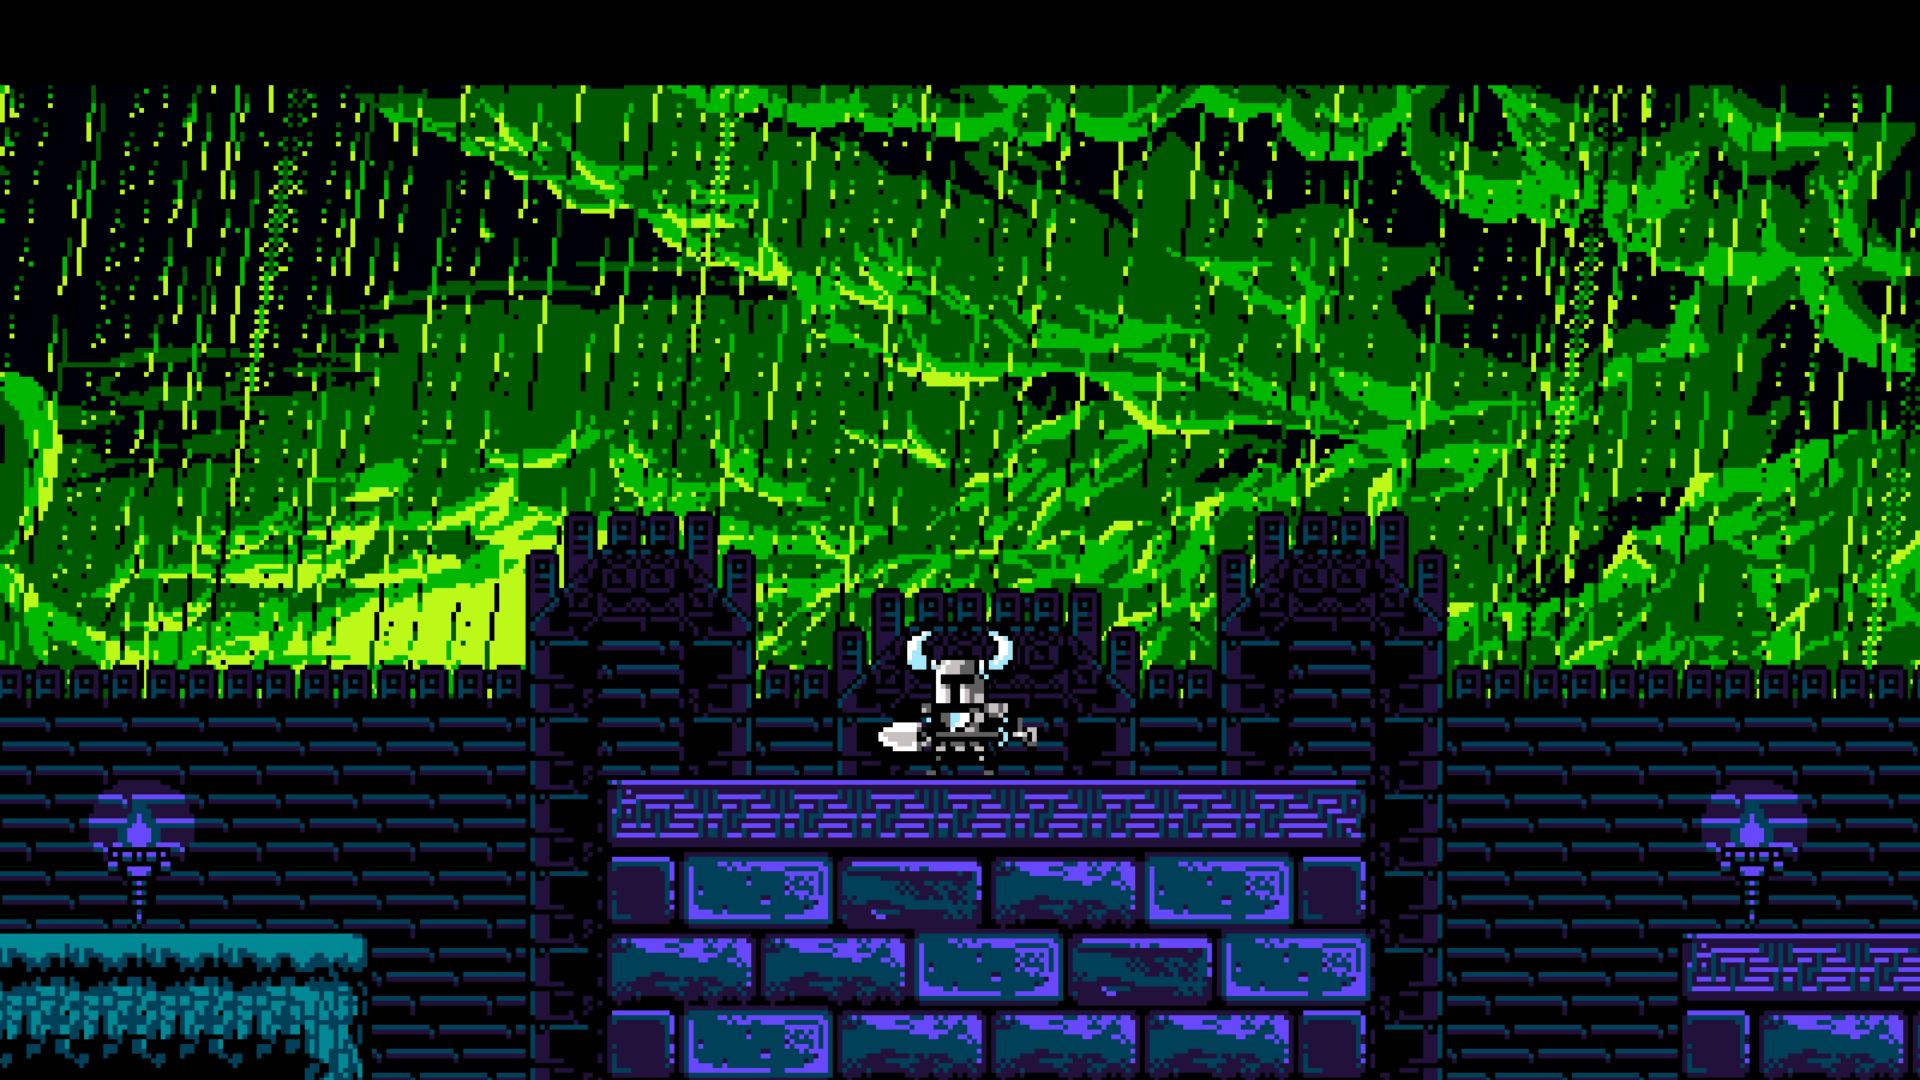 Wallpaper Video Games Night Pixel Art Green Retro